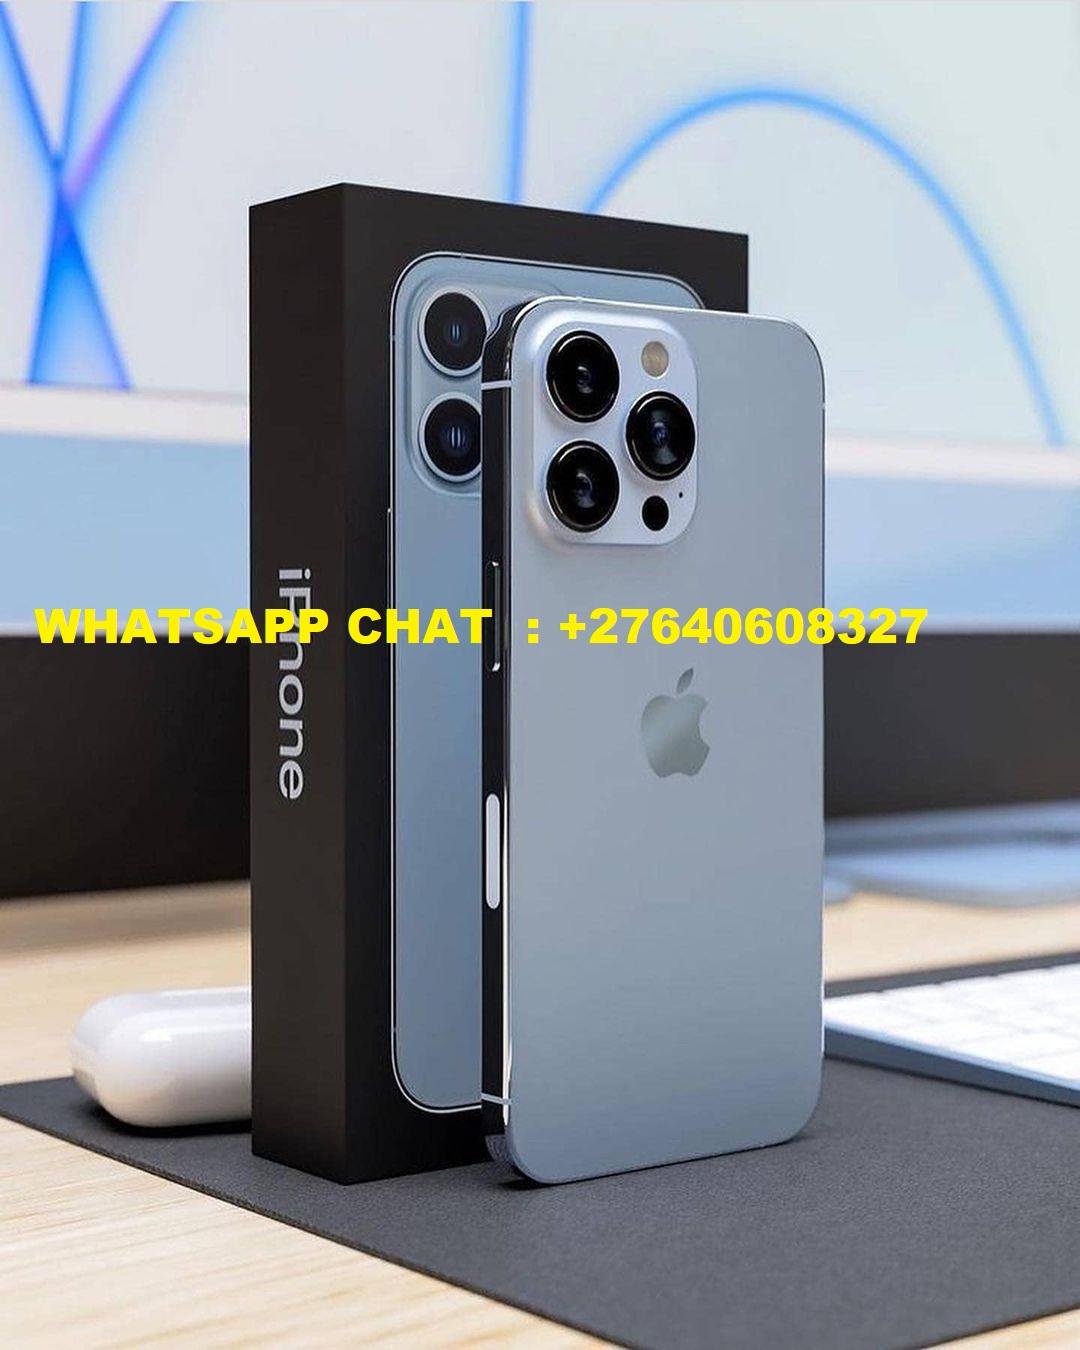 Apple iPhone 13 Pro 128GB για 700 EUR , iPhone 13 Pro Max 128GB για 750 EUR , iPhone 13 128GB για 550 EUR , iPhone 12 Pro 128GB για 500 EUR , iPhone 12 Pro Max 128GB για 550 EUR